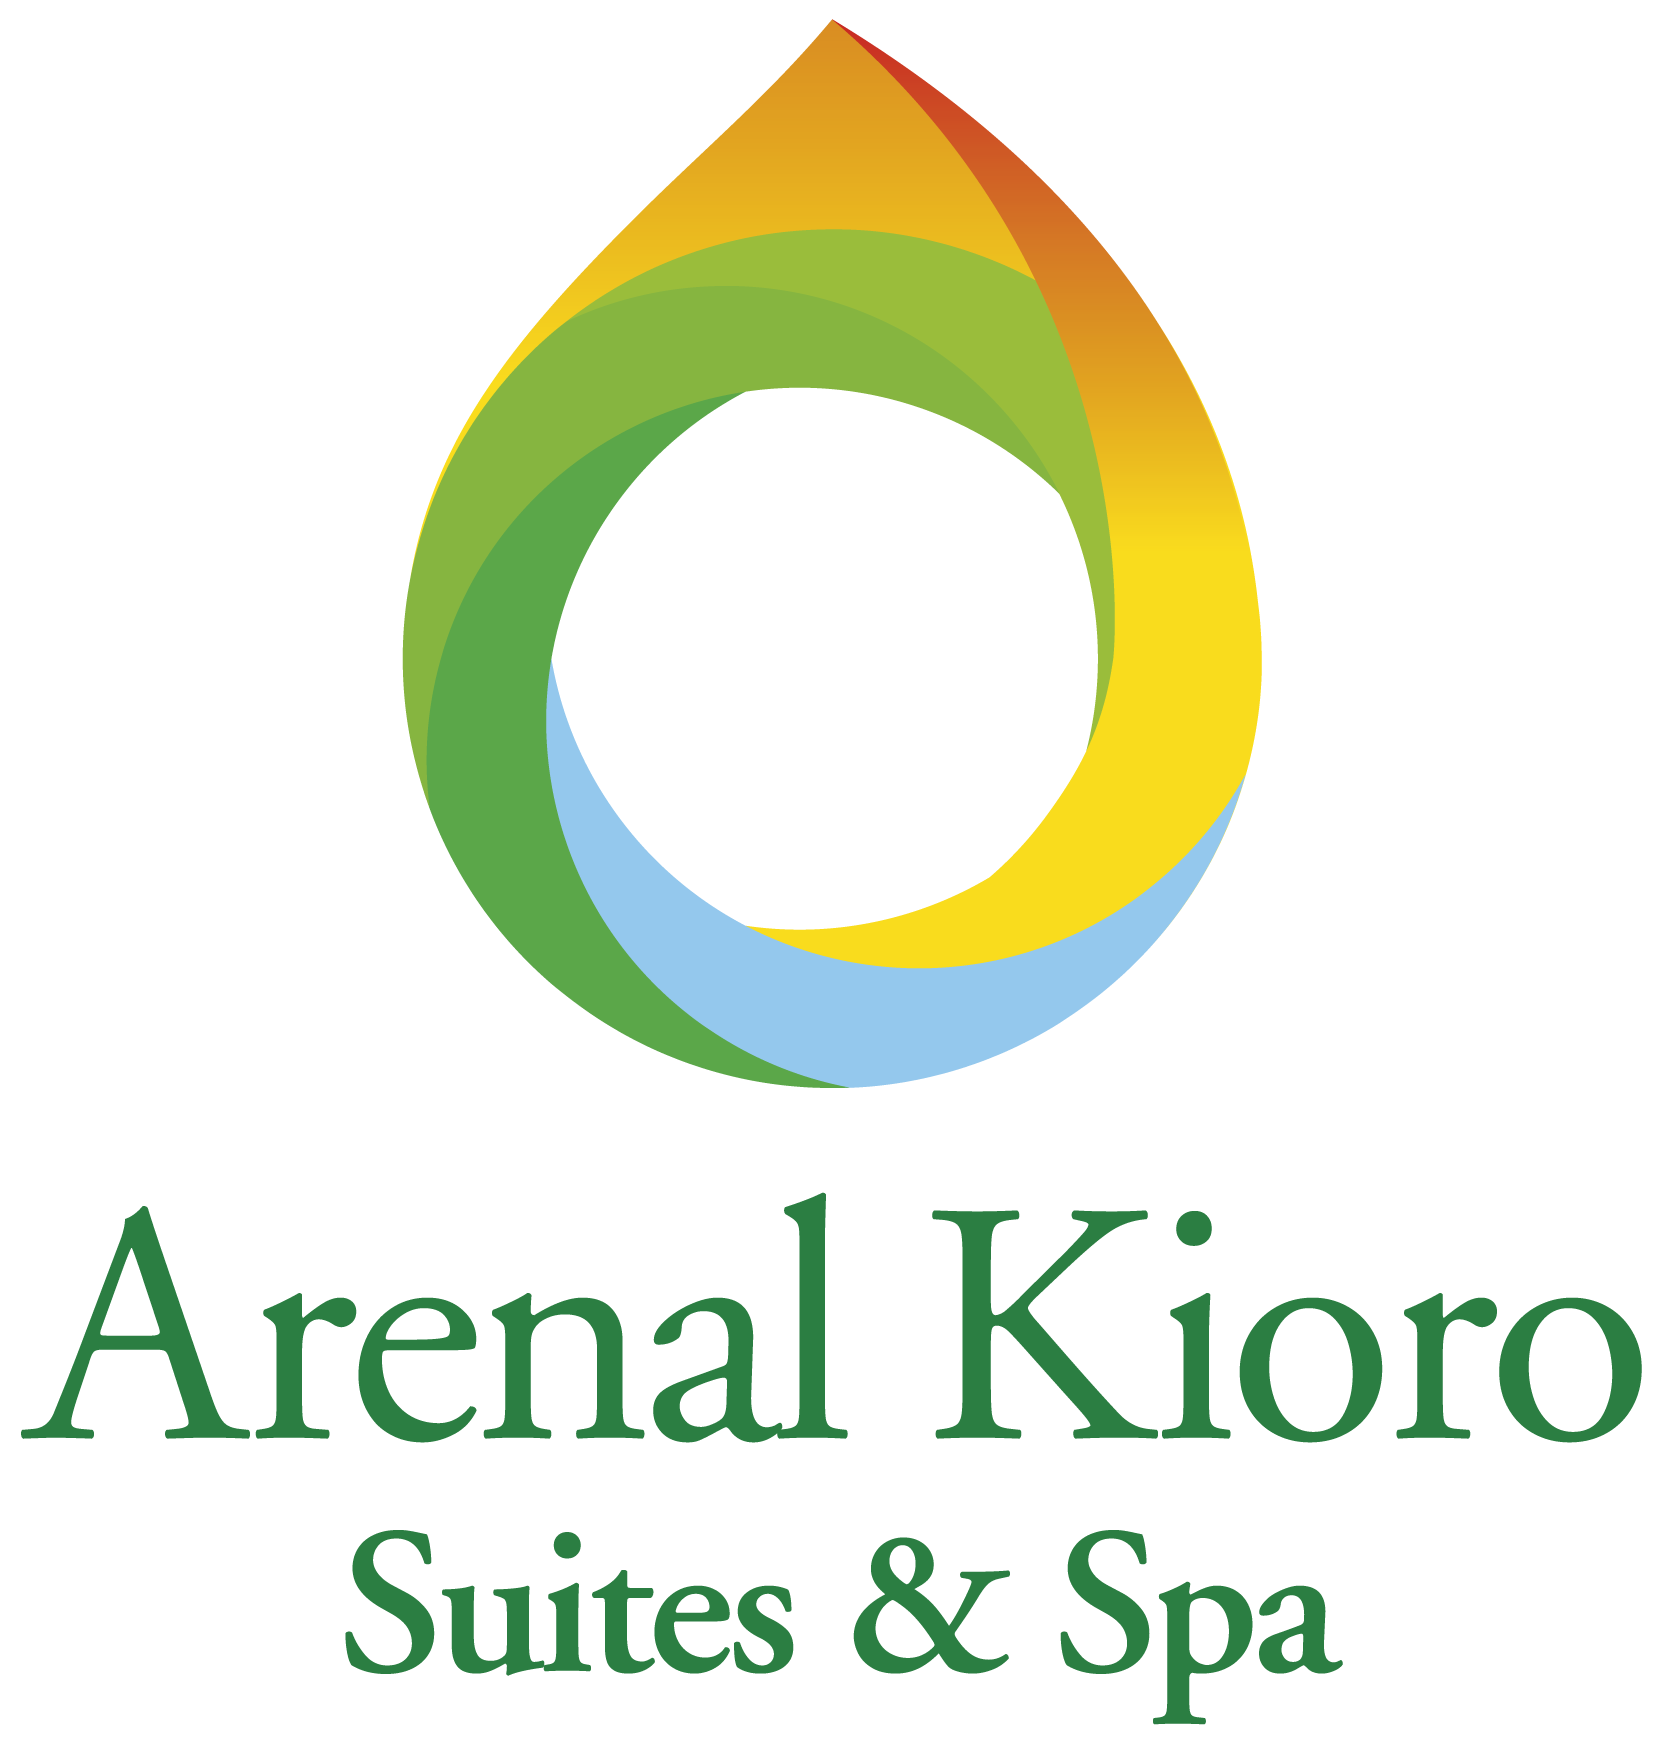 Hotel Arenal Kioro Suites & Spa